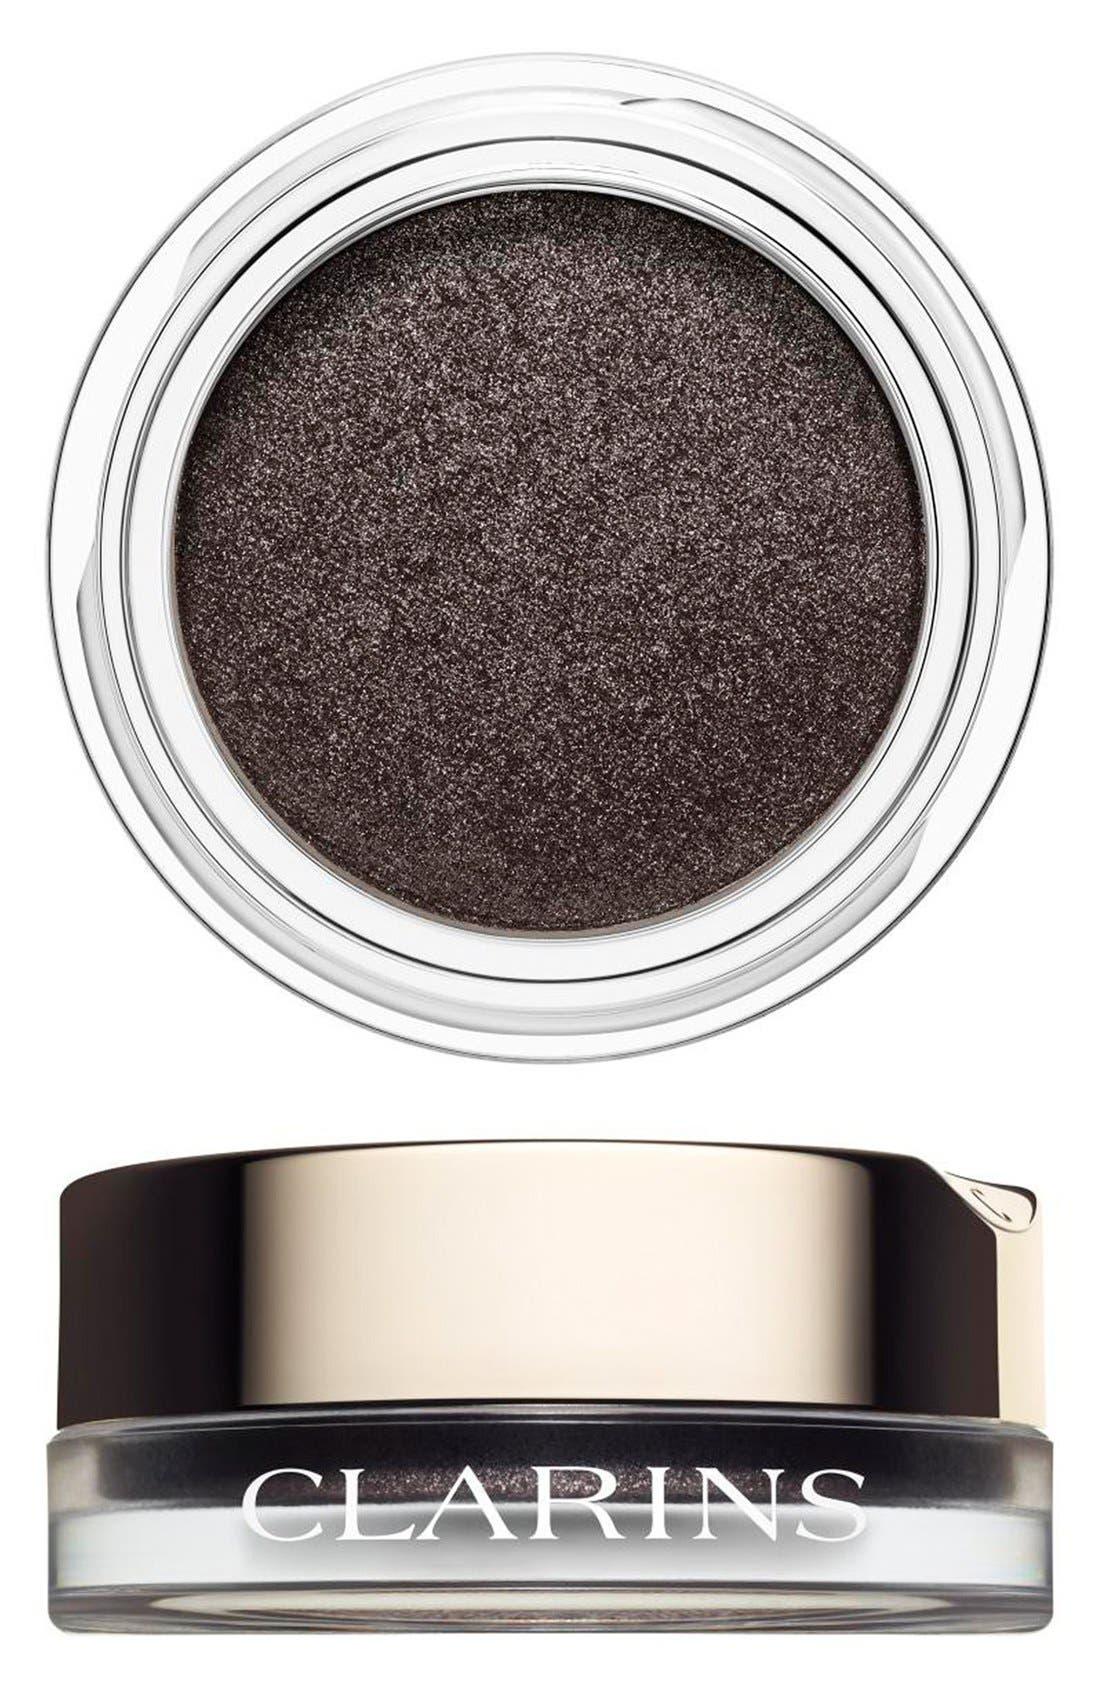 Ombré Matte Cream-to-Powder Matte Eyeshadow,                             Main thumbnail 1, color,                             05 SPARKLE GREY